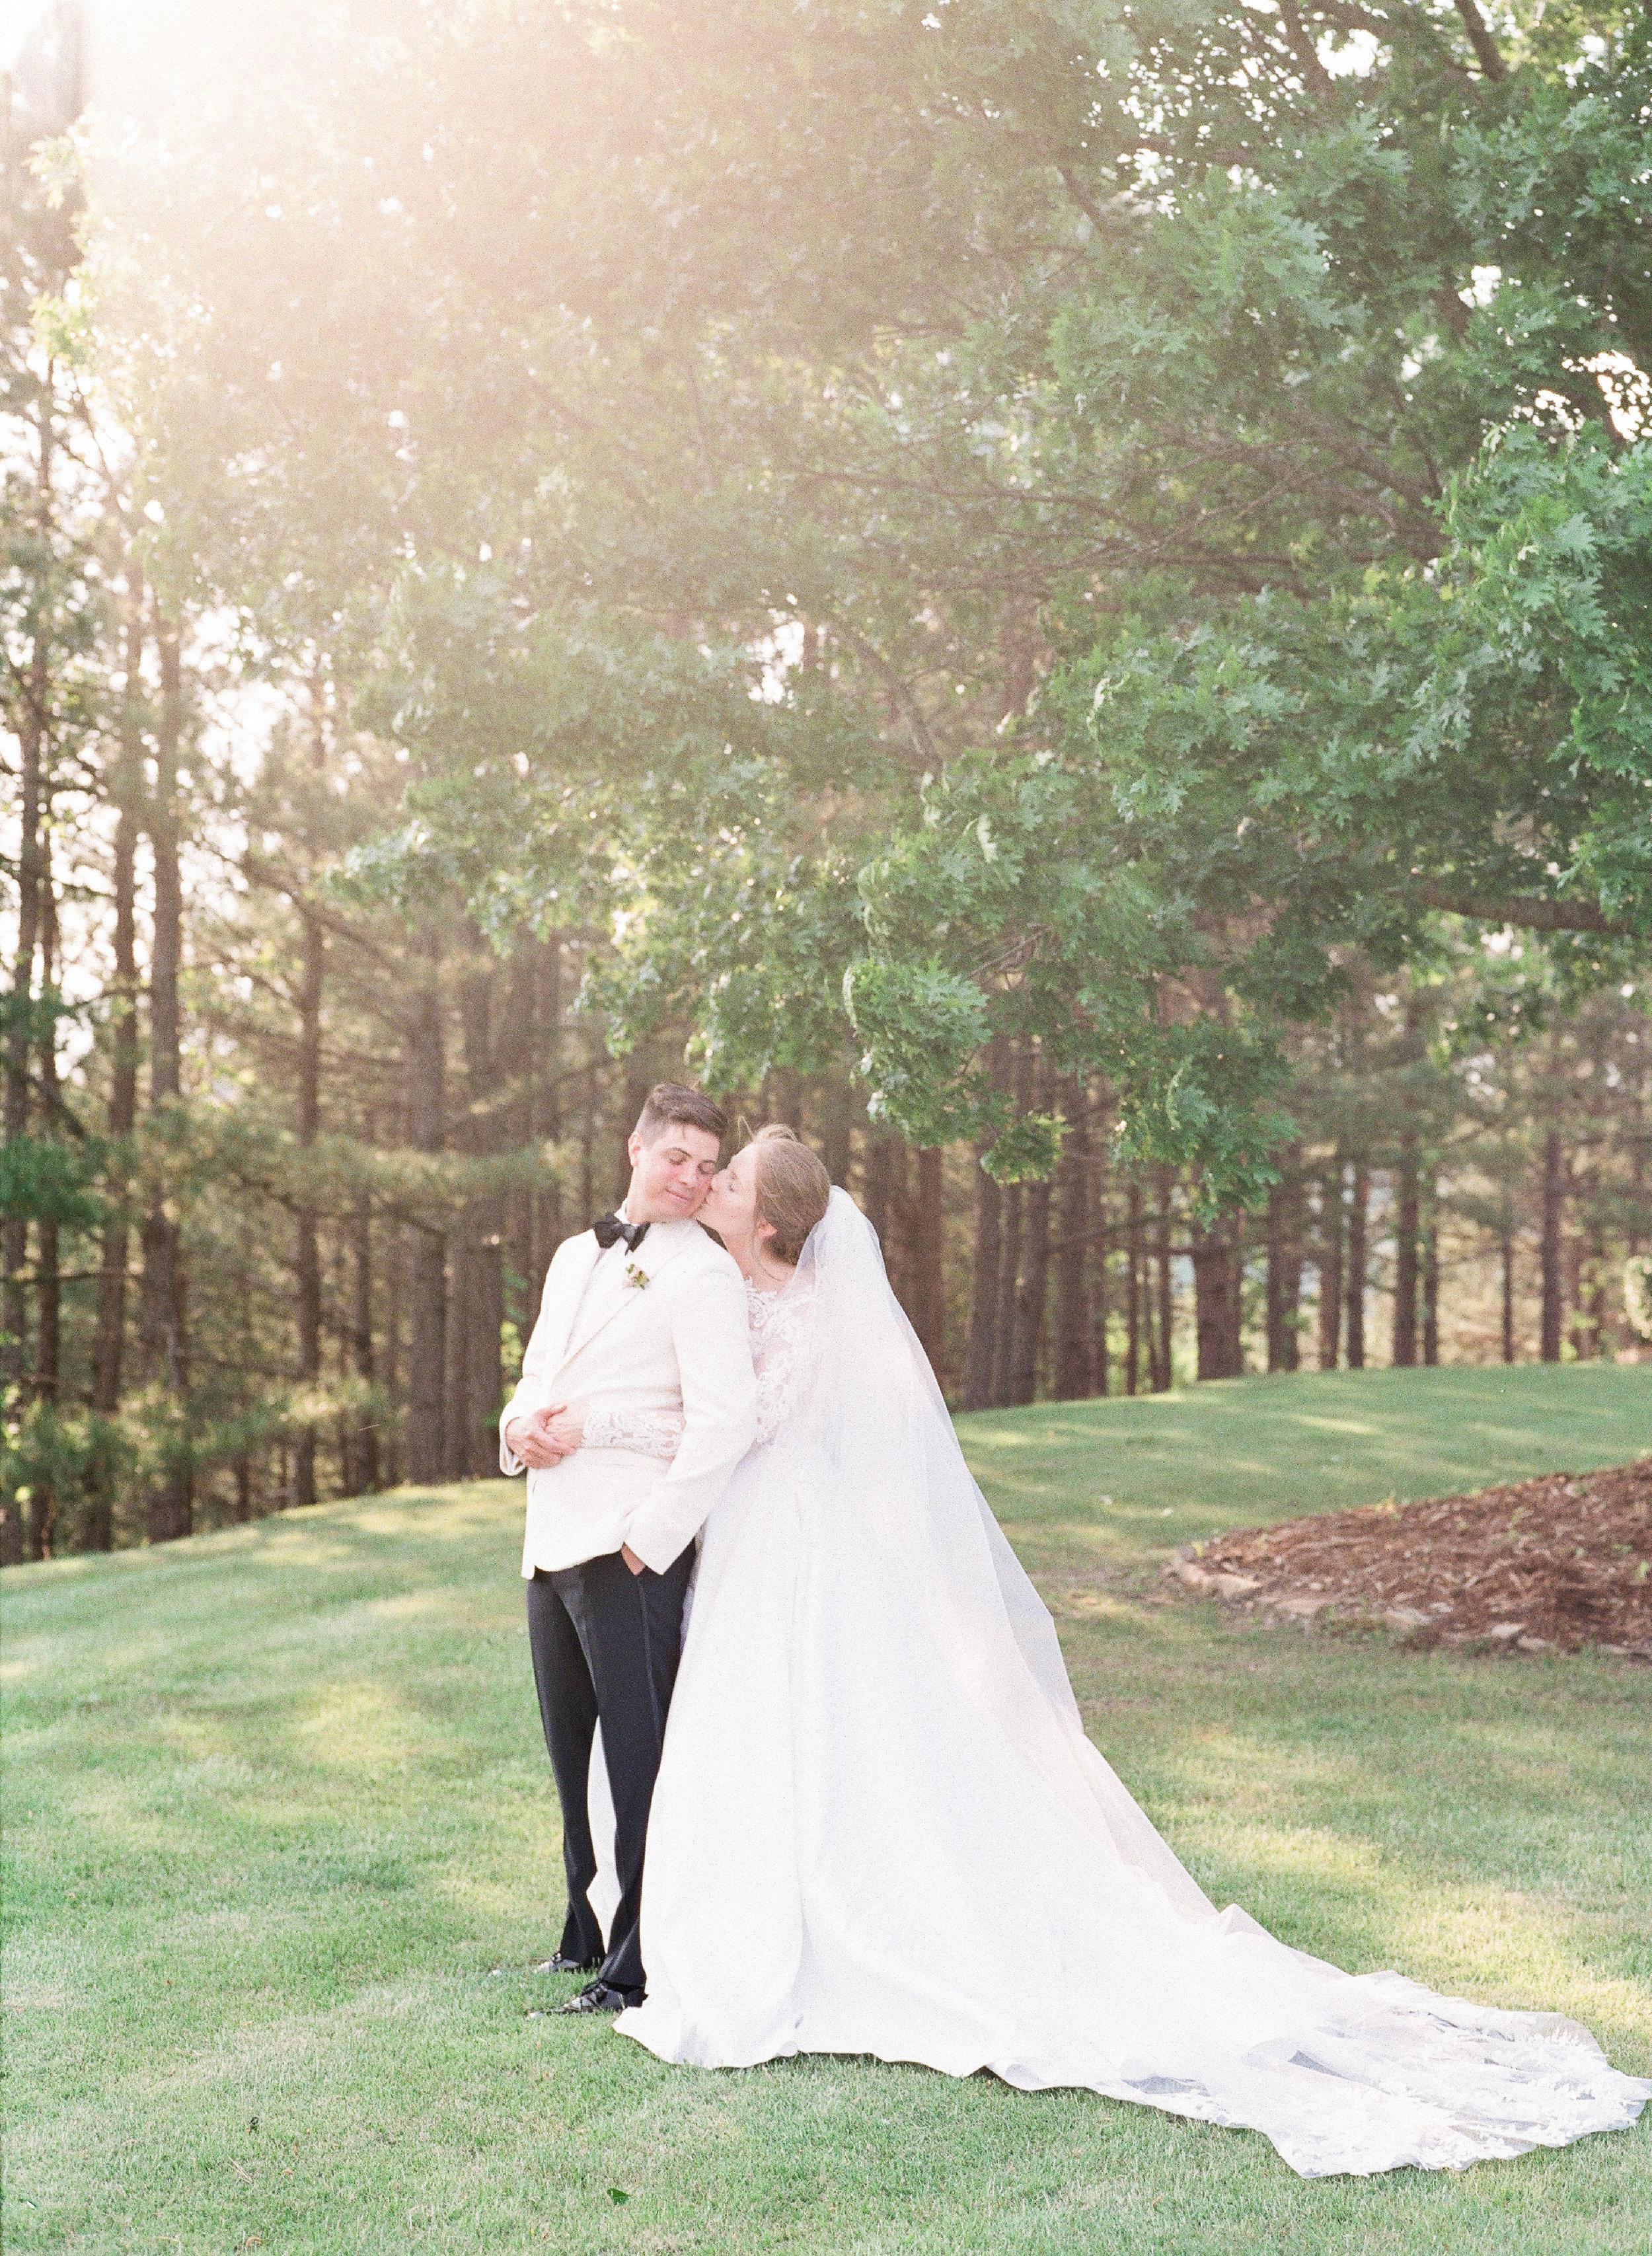 Romantic garden wedding at Goodwin Manor in Little Rock, Arkansas. Wedding photography by wedding photographer Natalie Smith